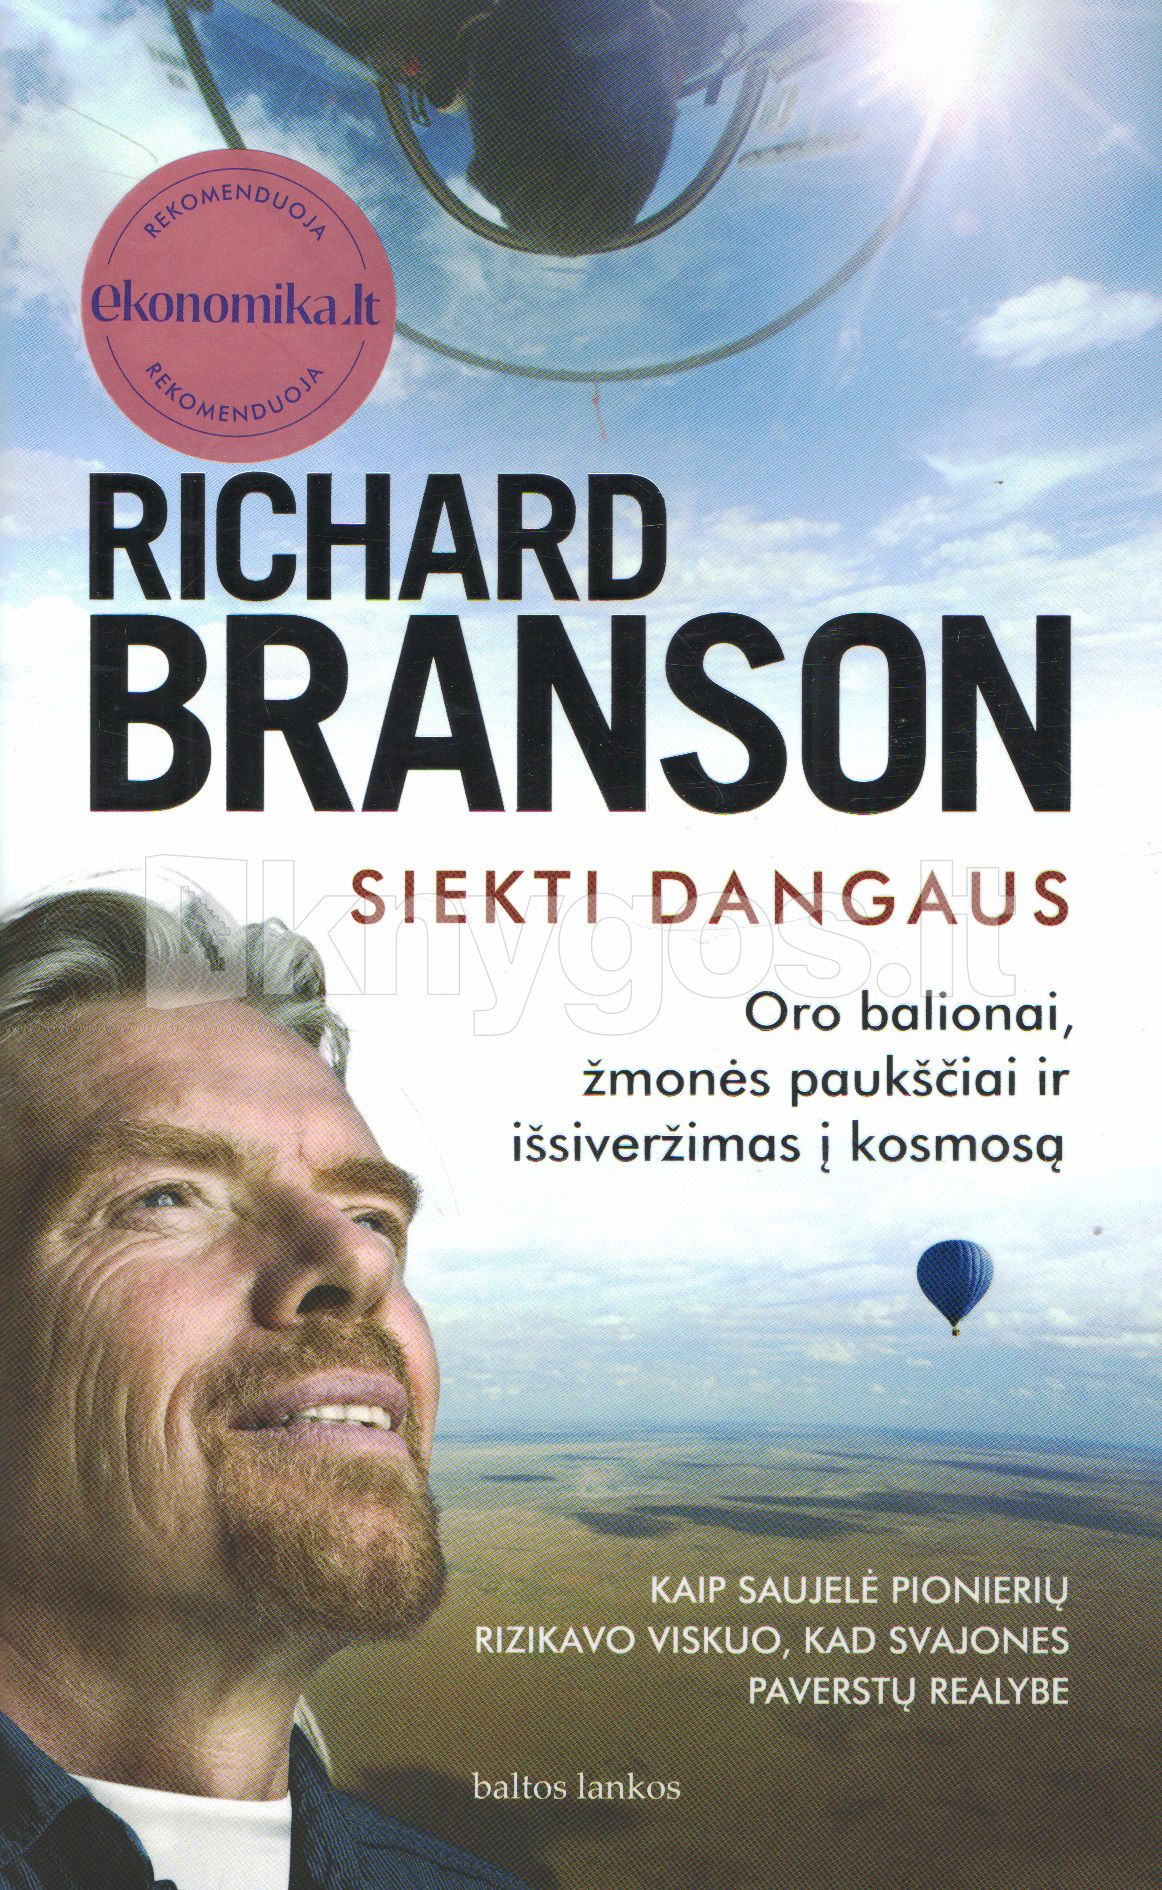 Siekti dangaus, Richard Branson: Knyga [9789955235996 ...